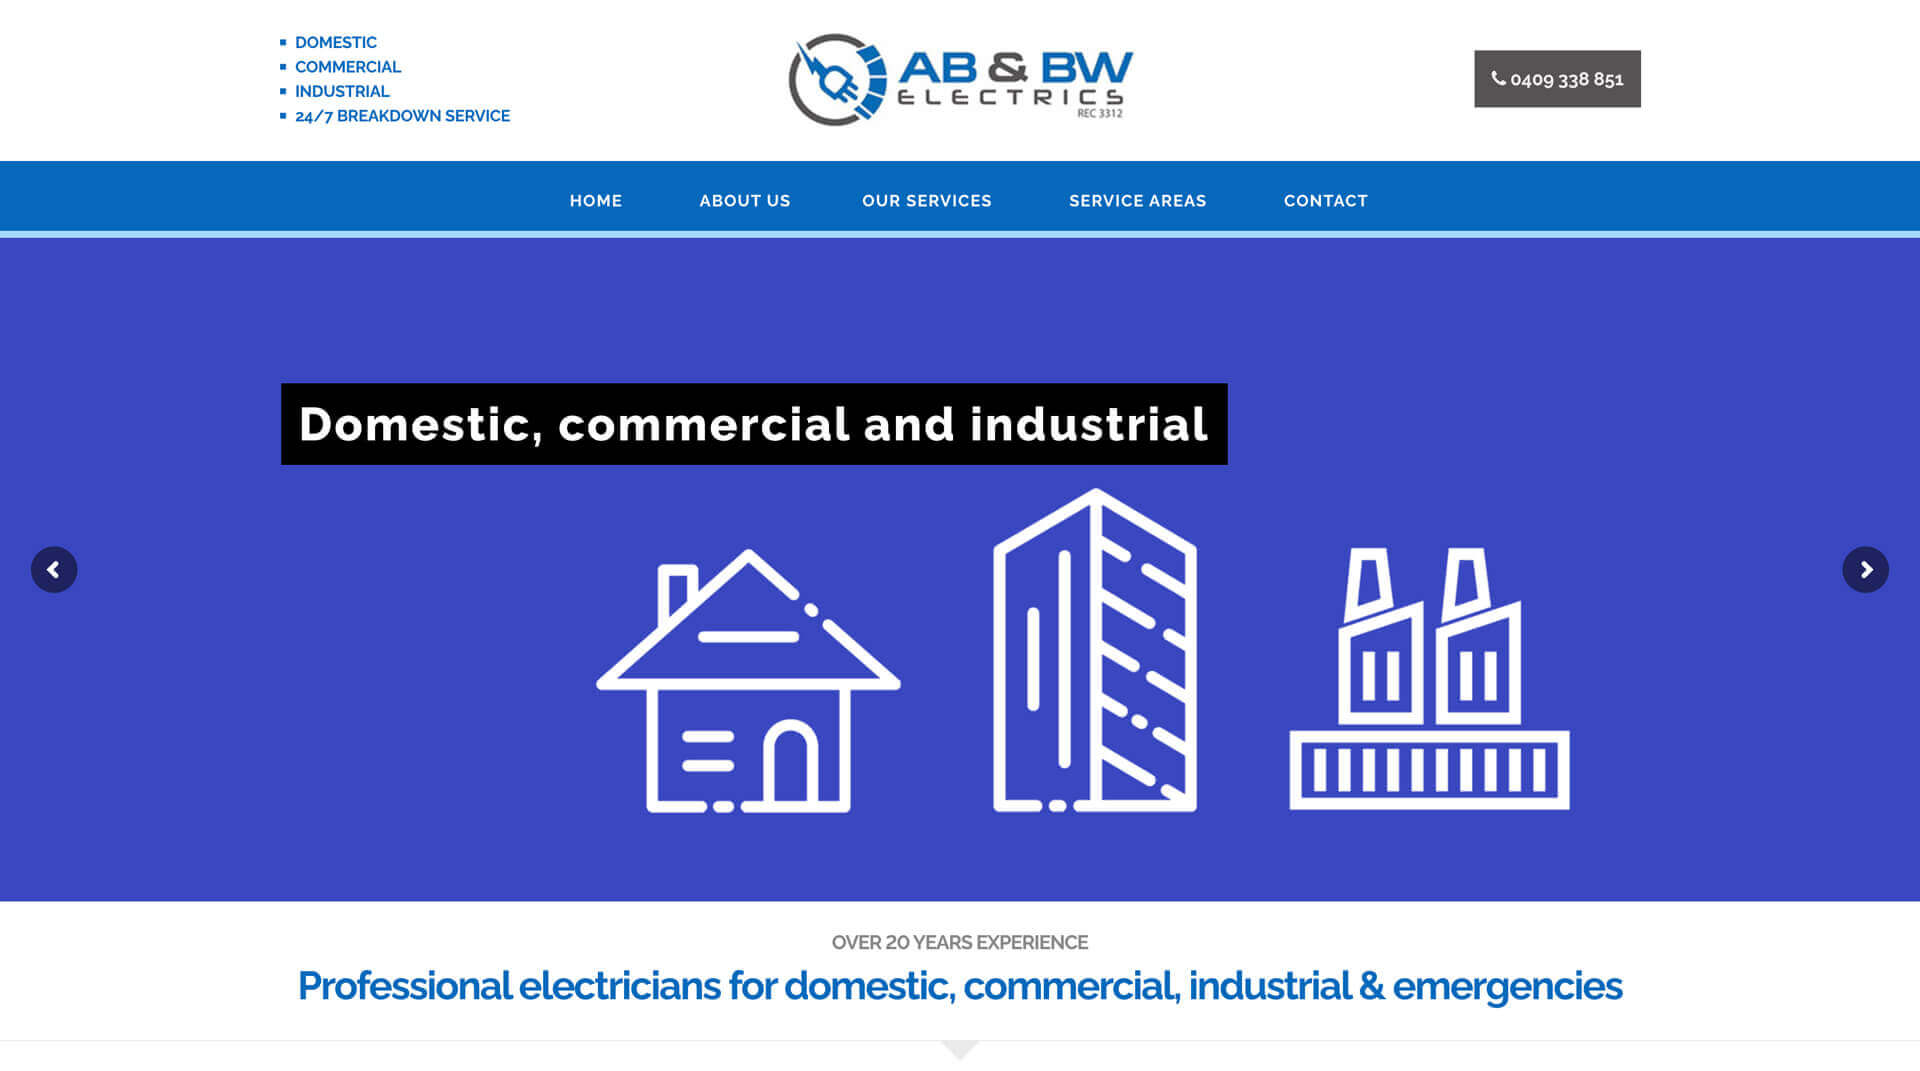 AB & BW Electrics